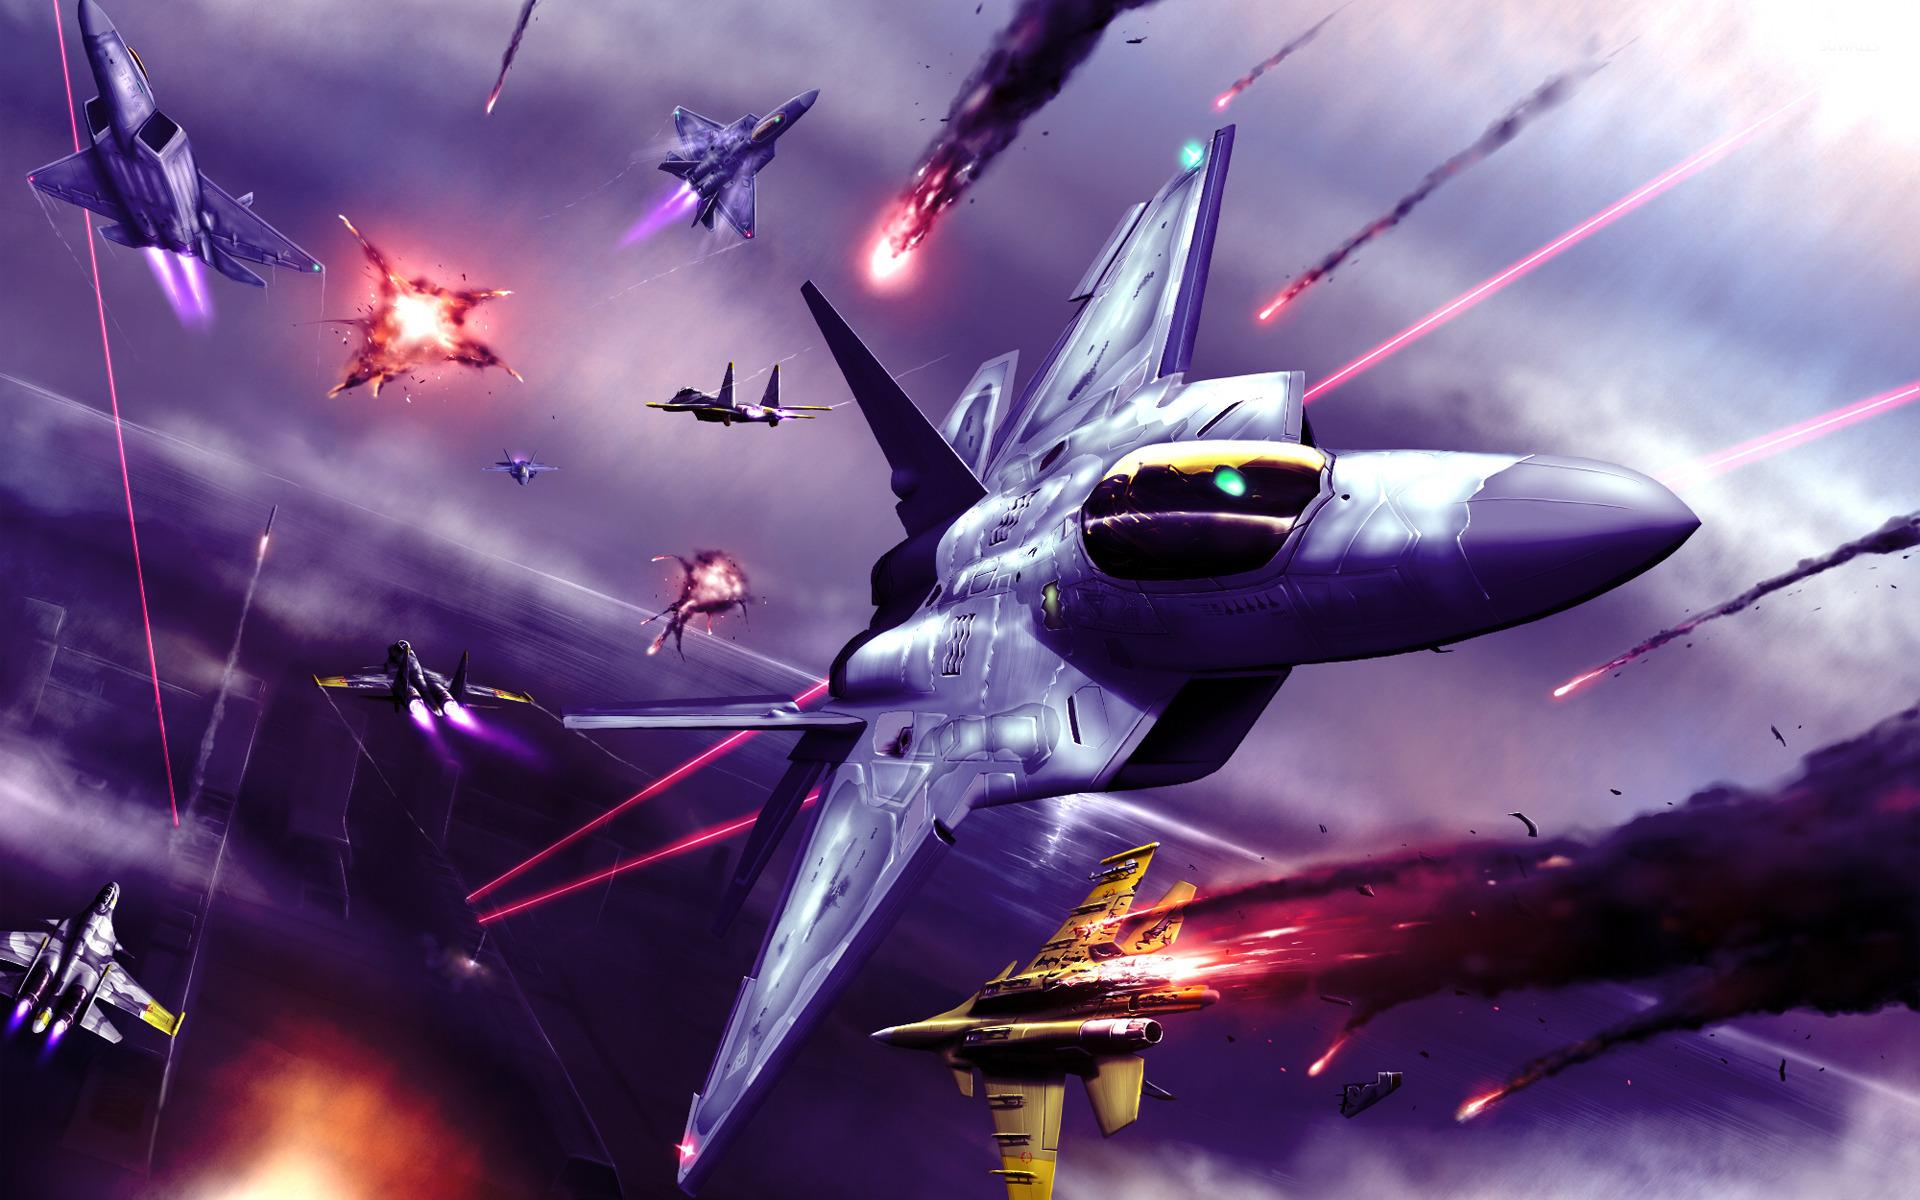 Ace Combat wallpaper   Game wallpapers   18022 1920x1200